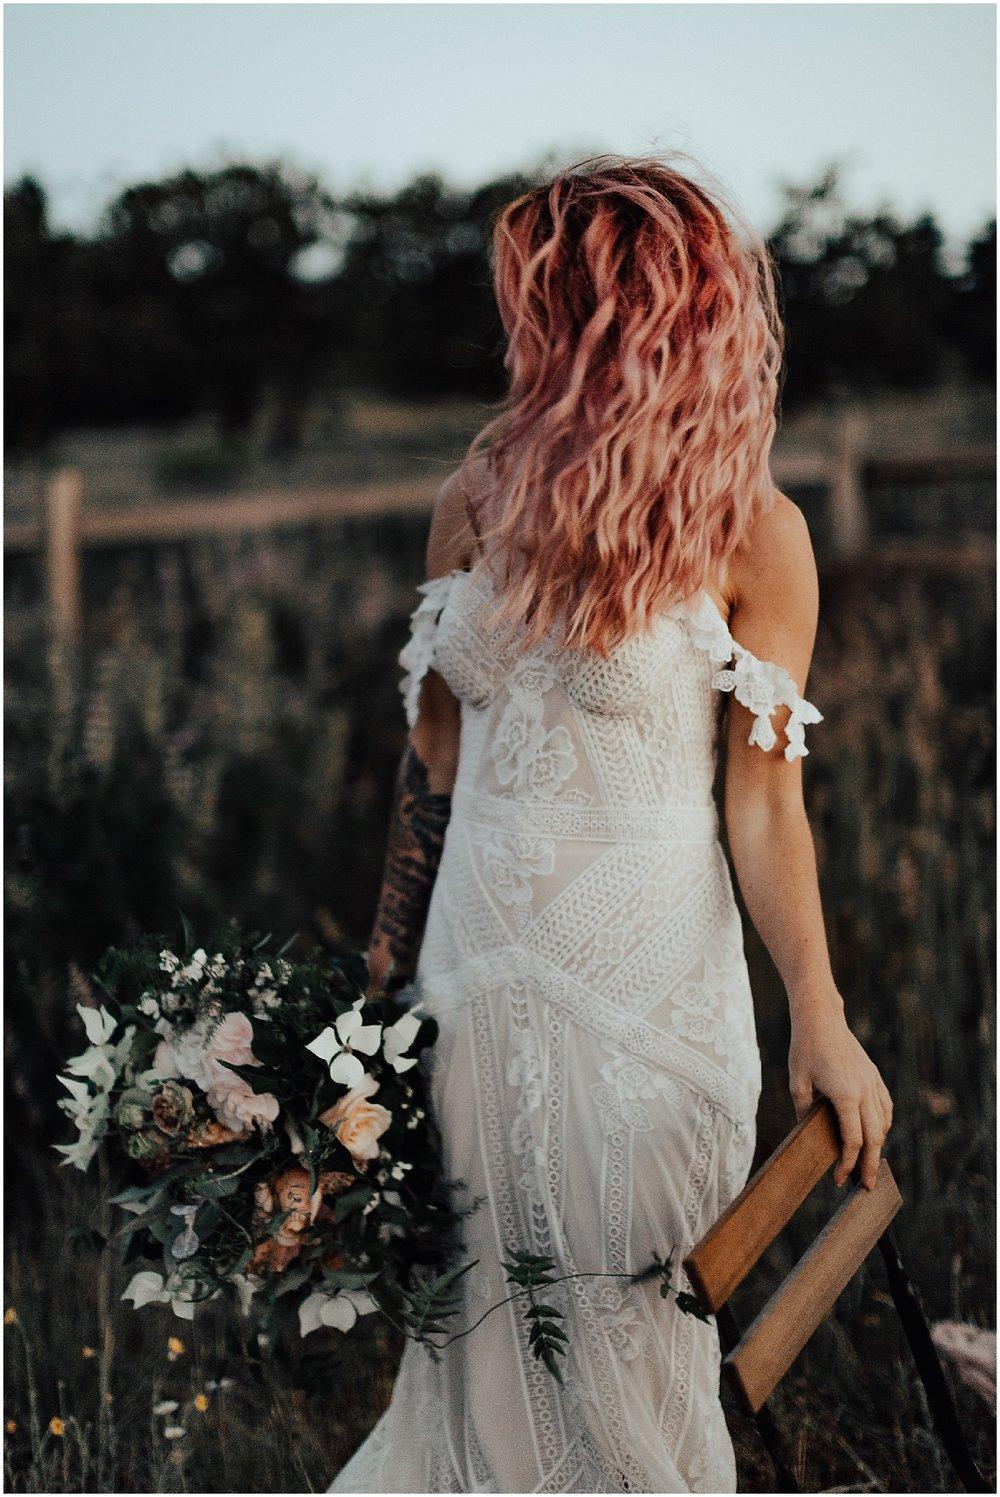 Portland Florist | Oregon Florist | Austin Florist | Good Seed Floral Design